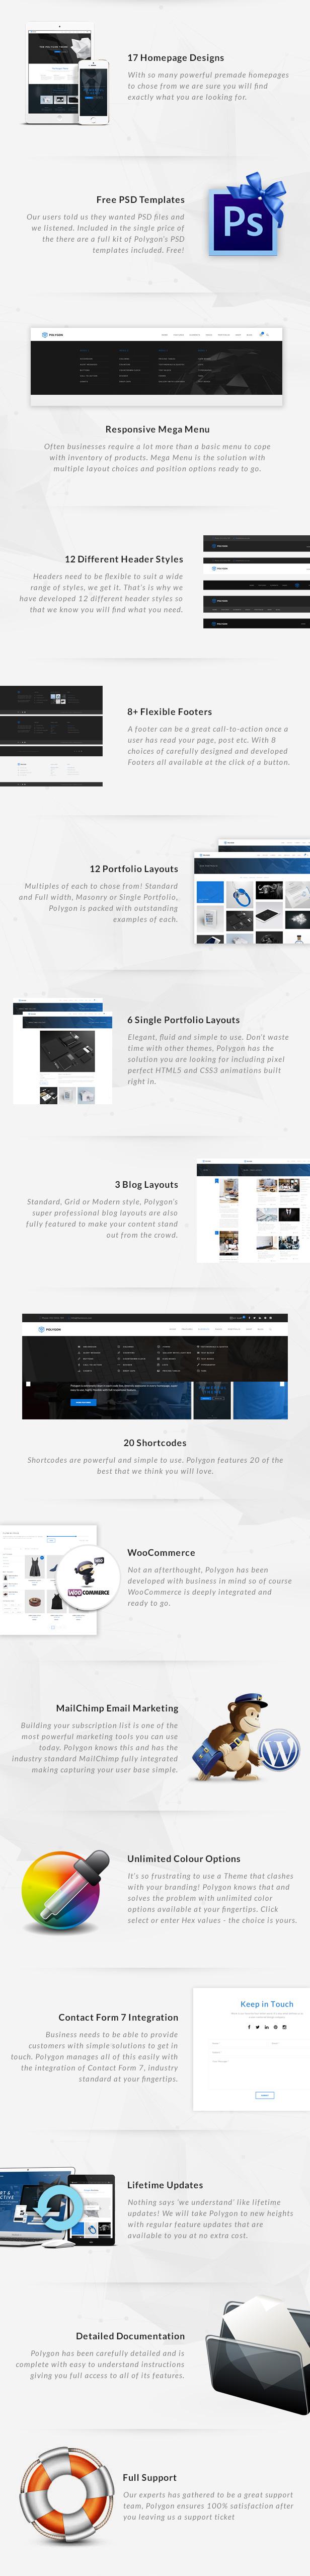 Business Corporation WordPress Theme - Premium theme